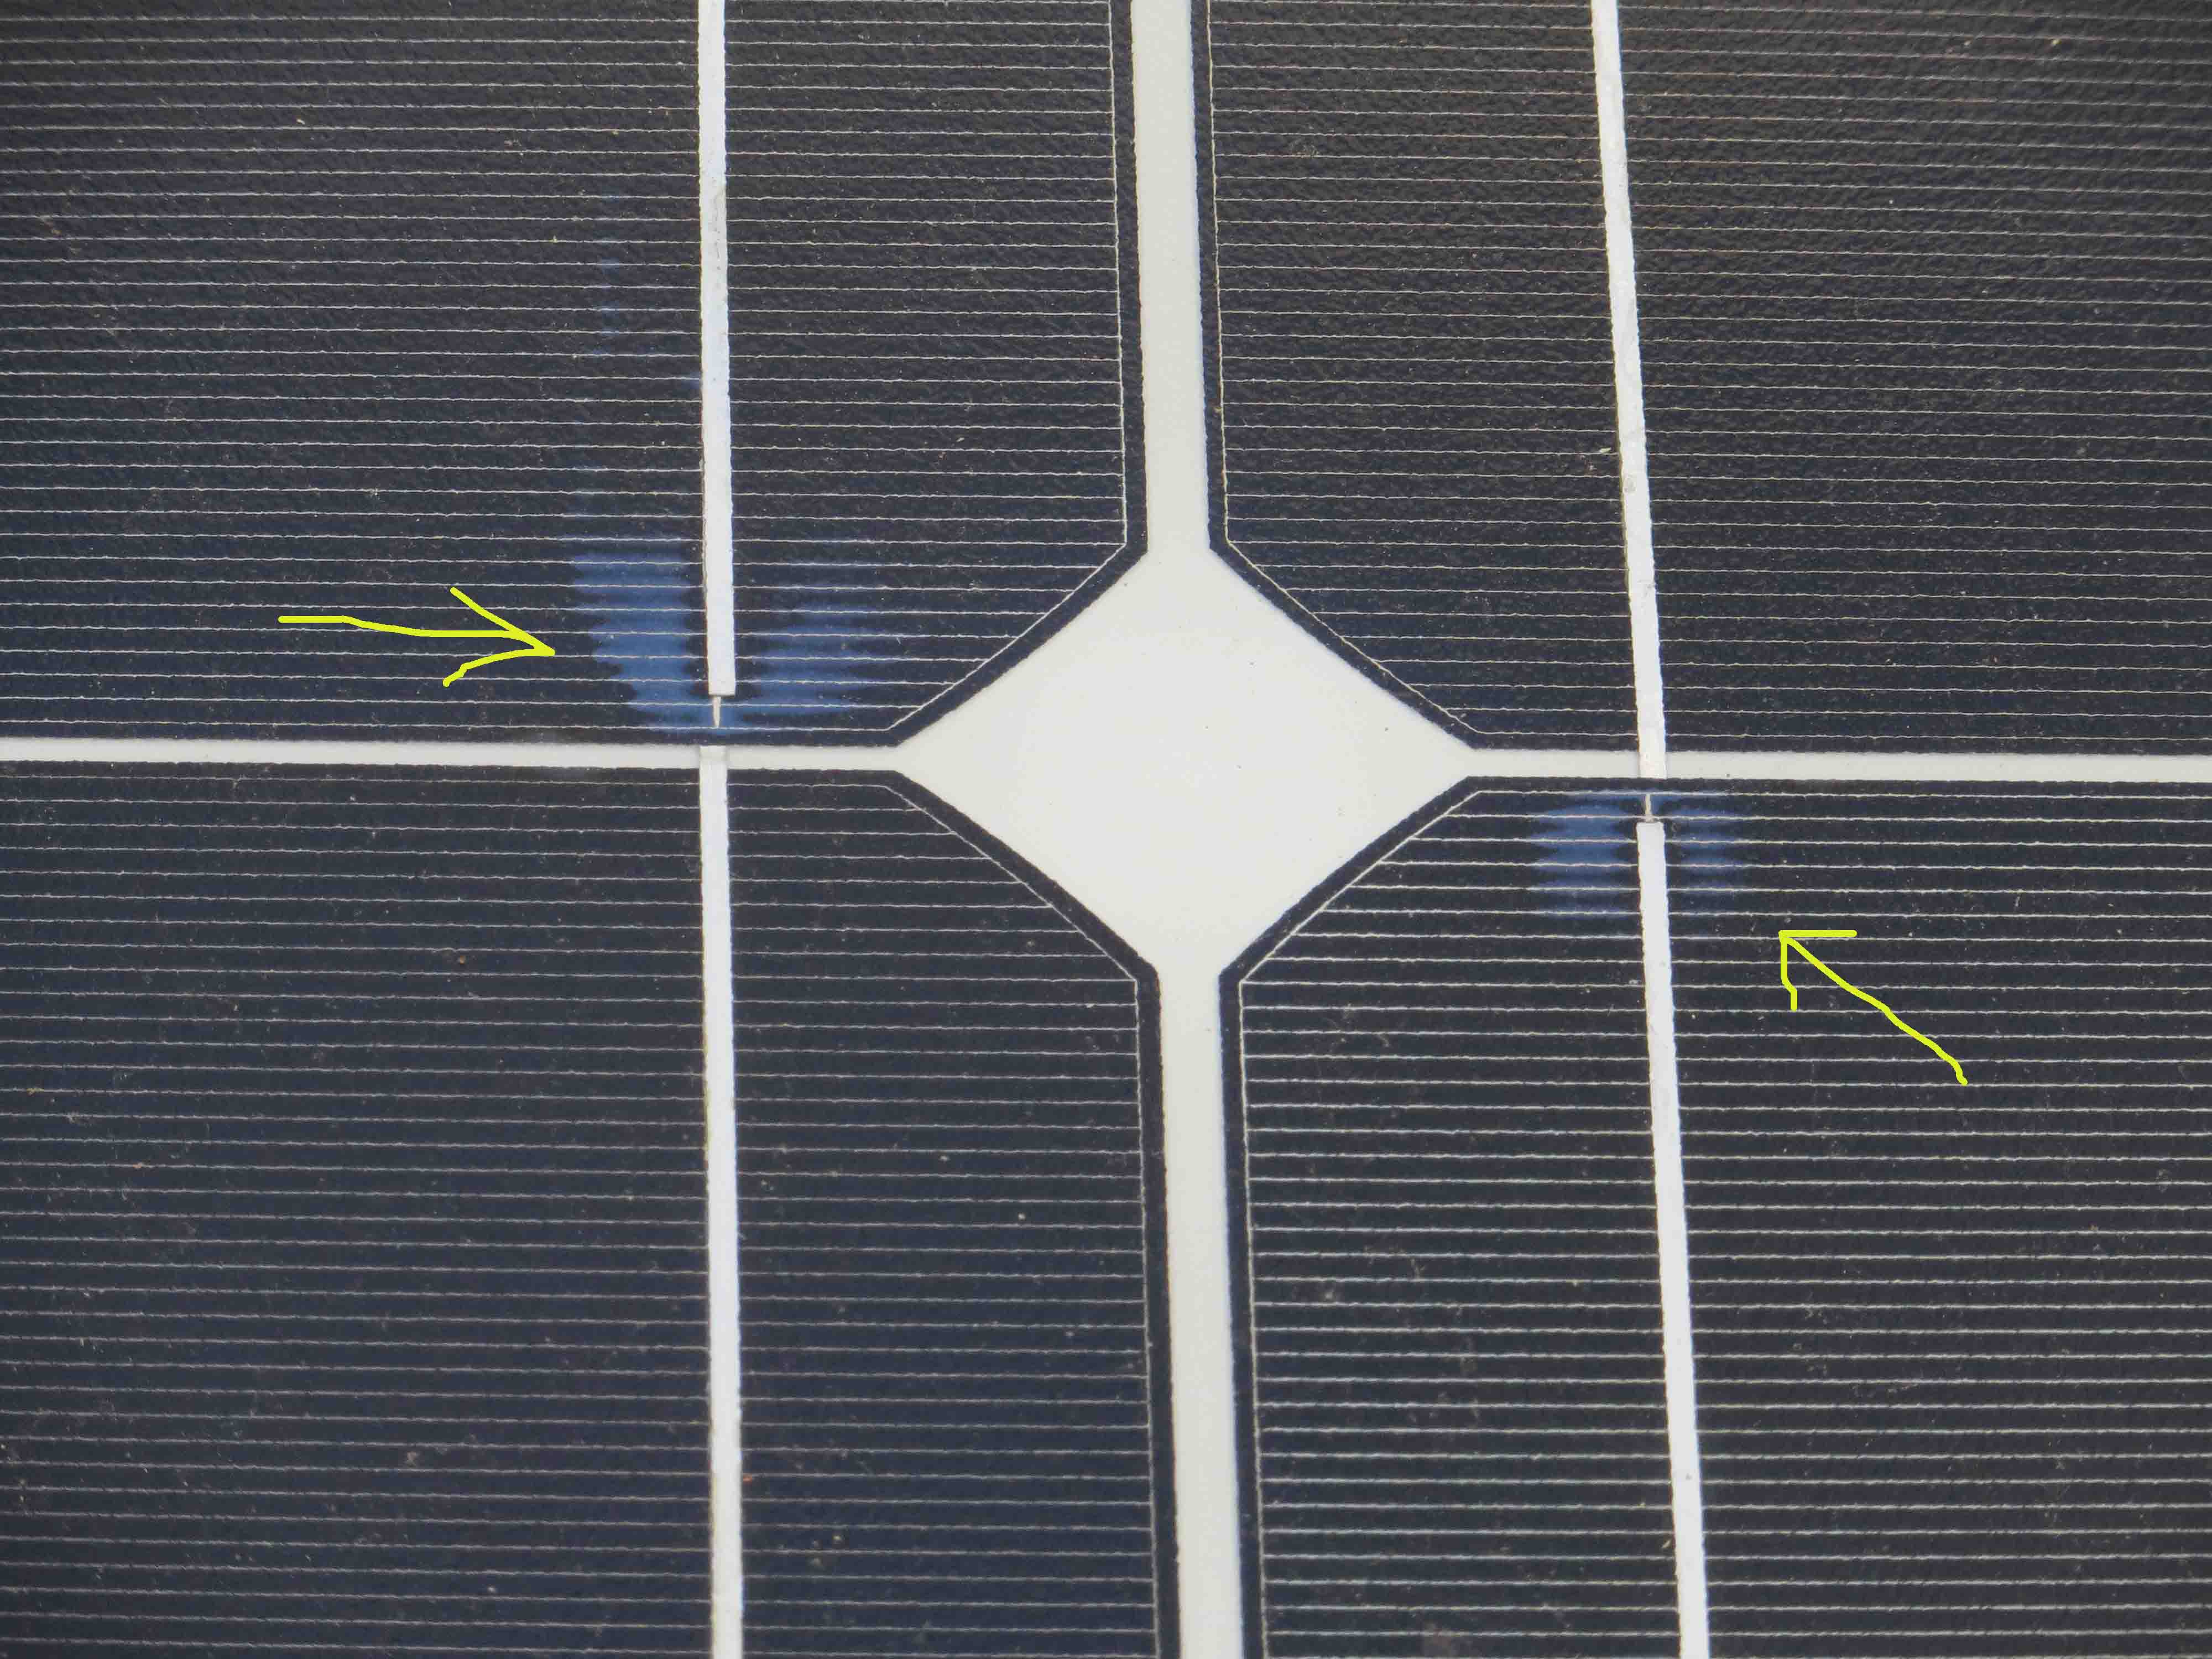 panel fault 2